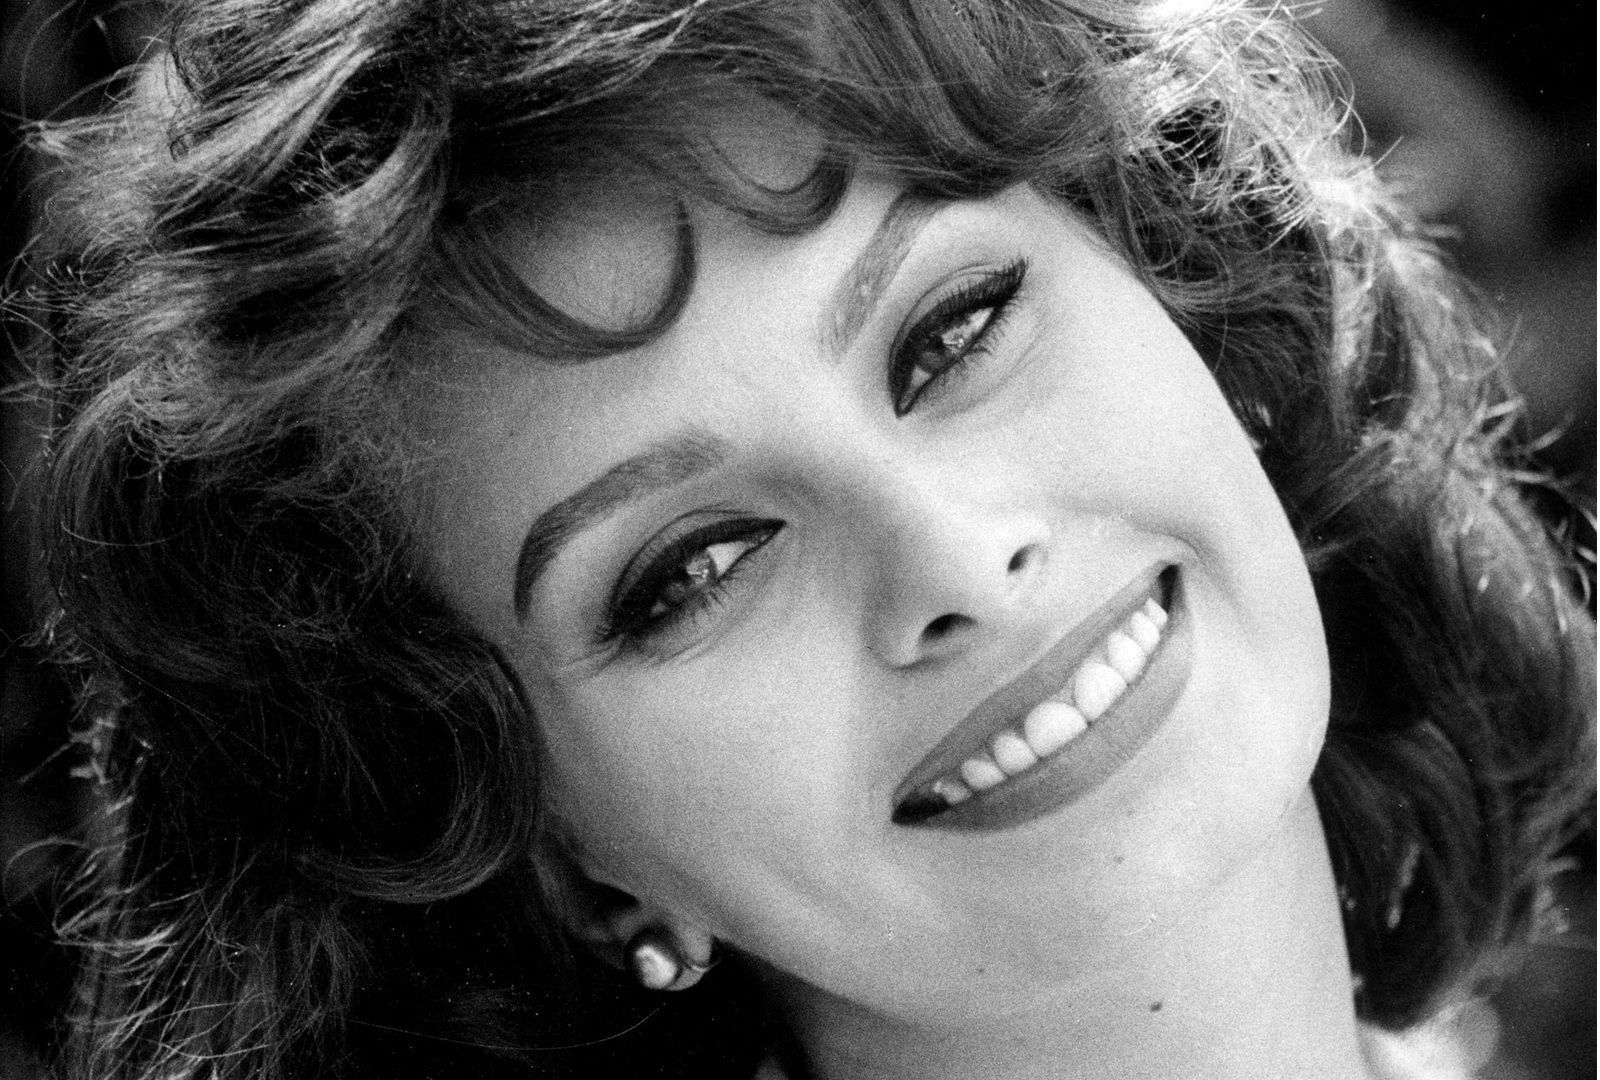 Sophia Loren Wallpapers @ go4celebrity.com